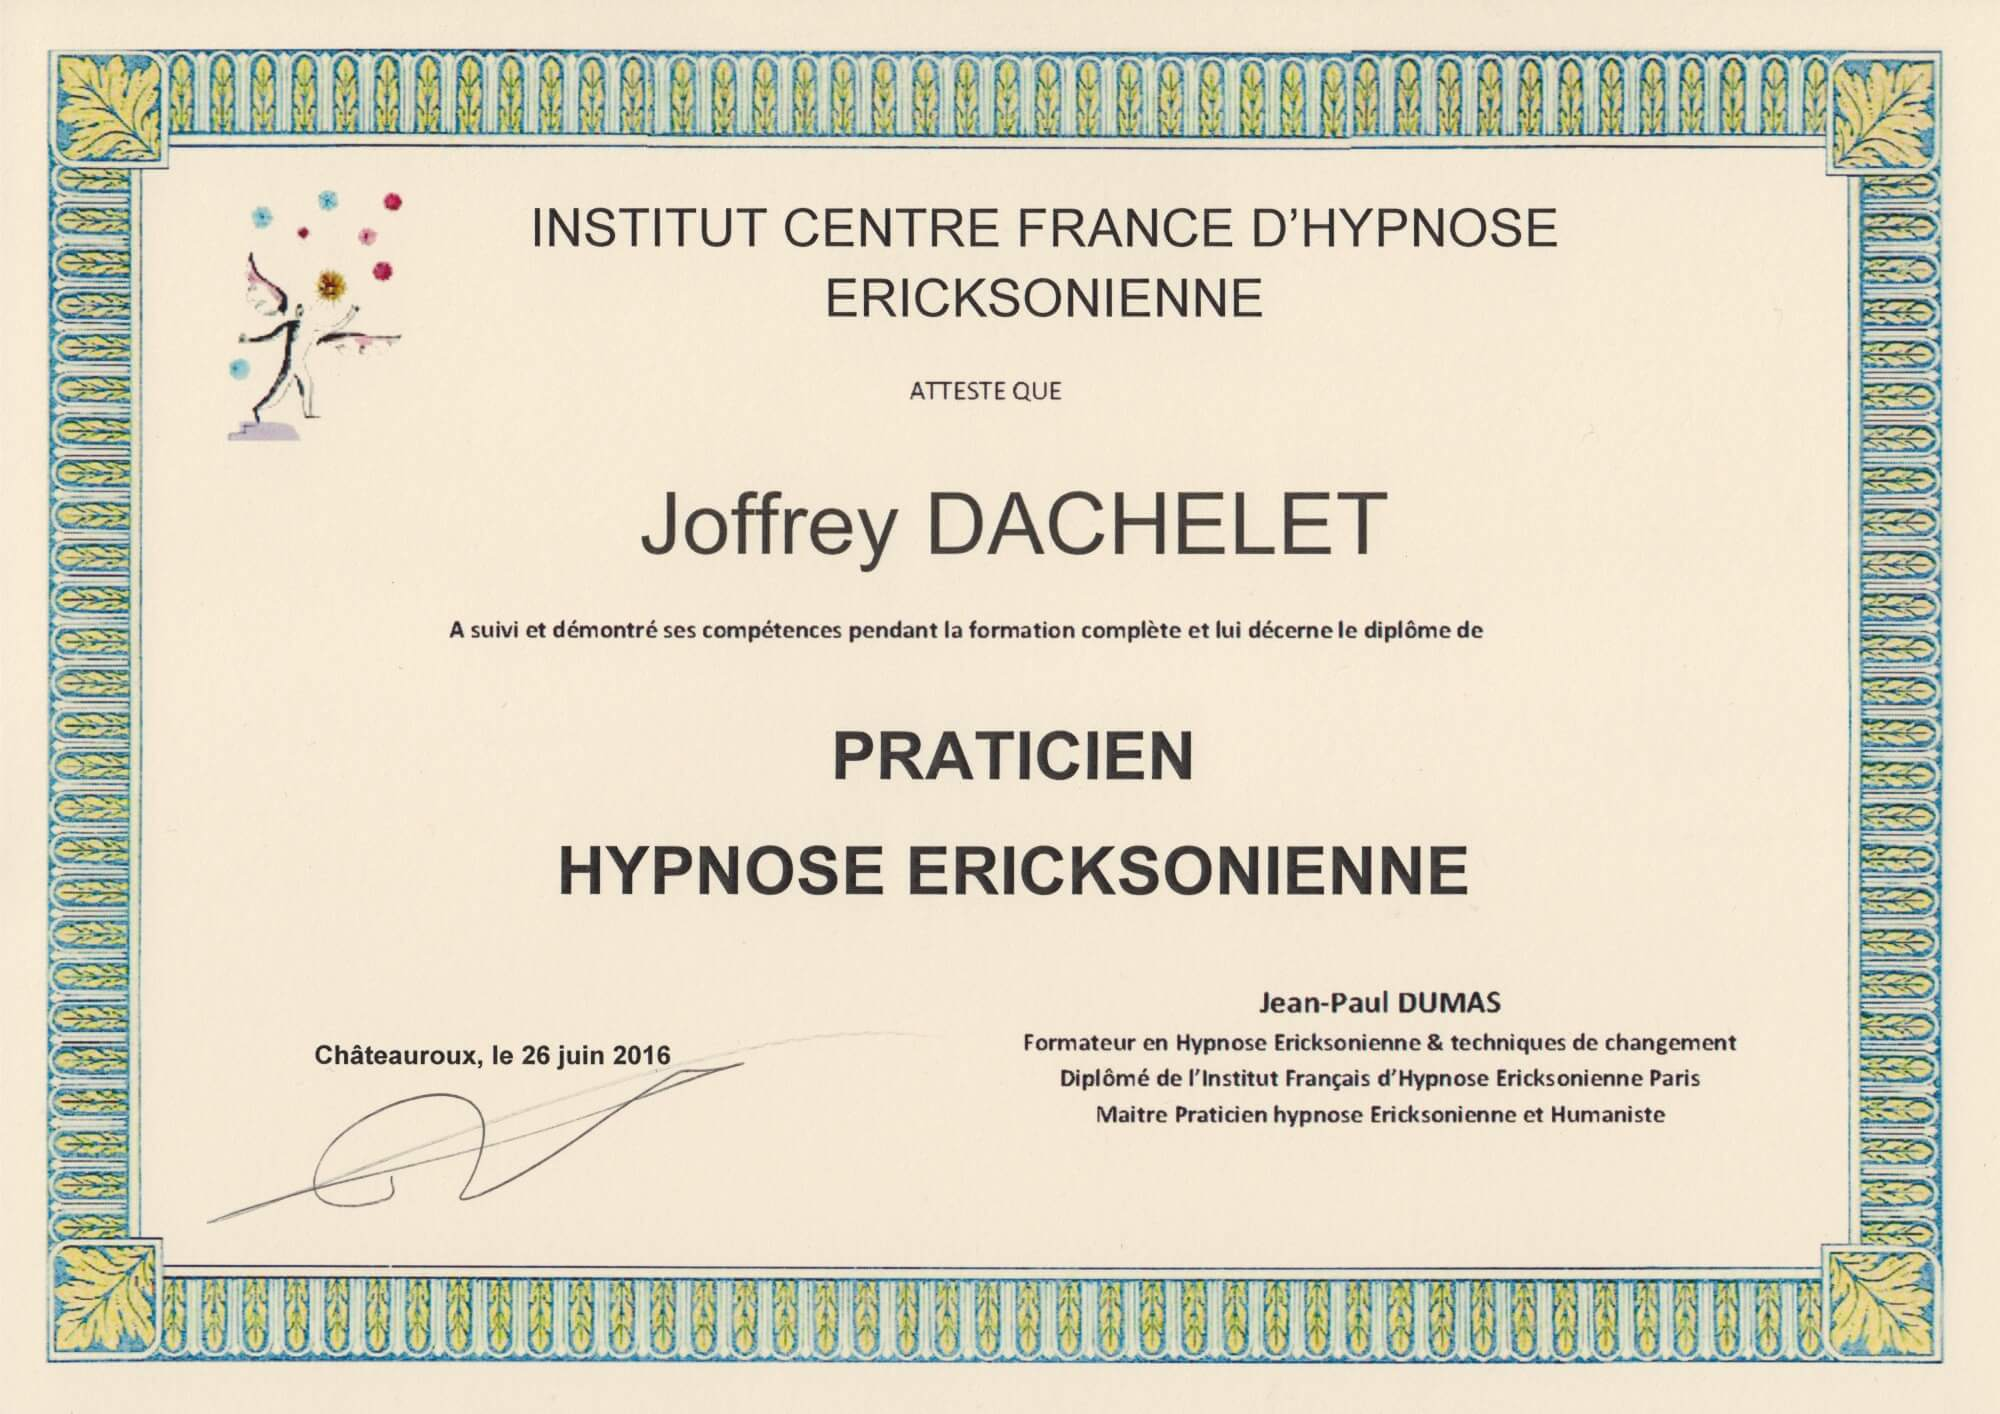 diplome ICFHE-praticien-hypnose